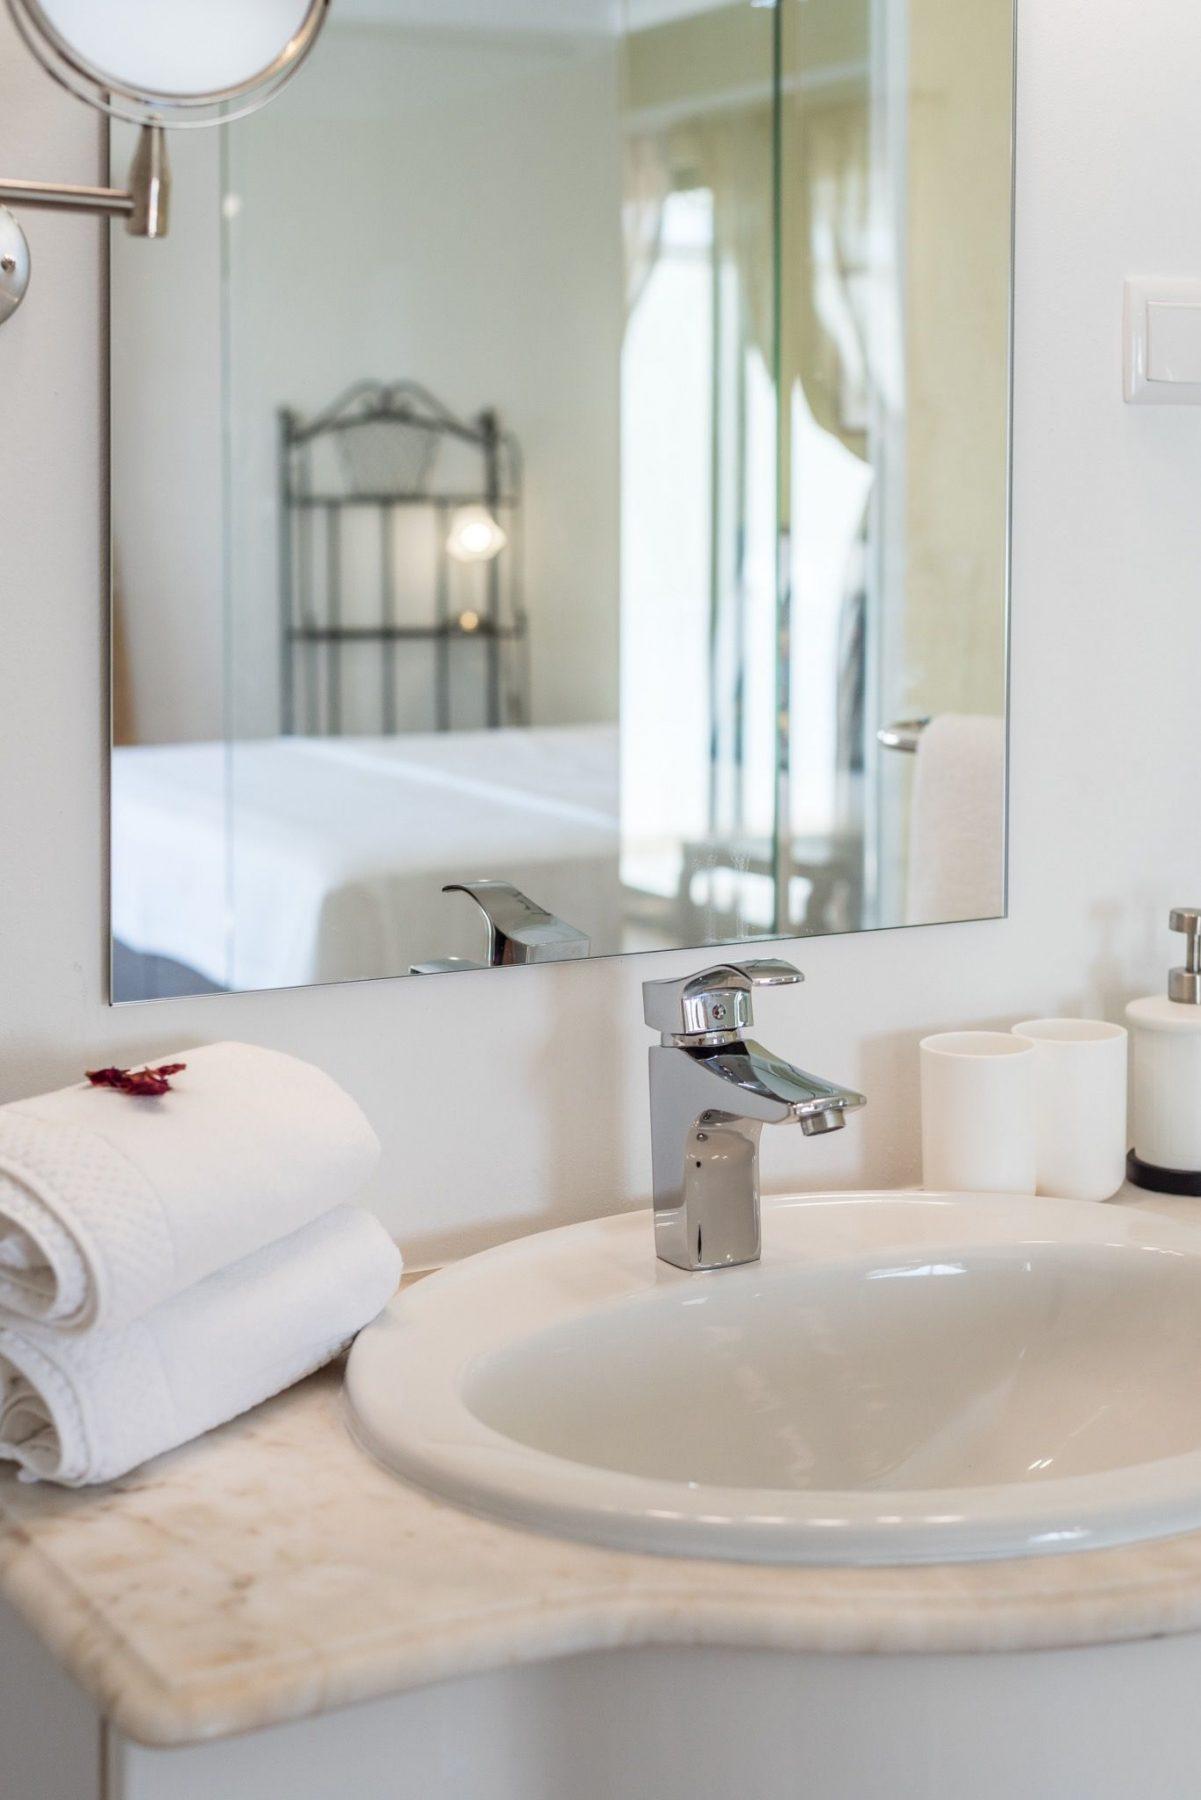 Rosemary bathroom mirror